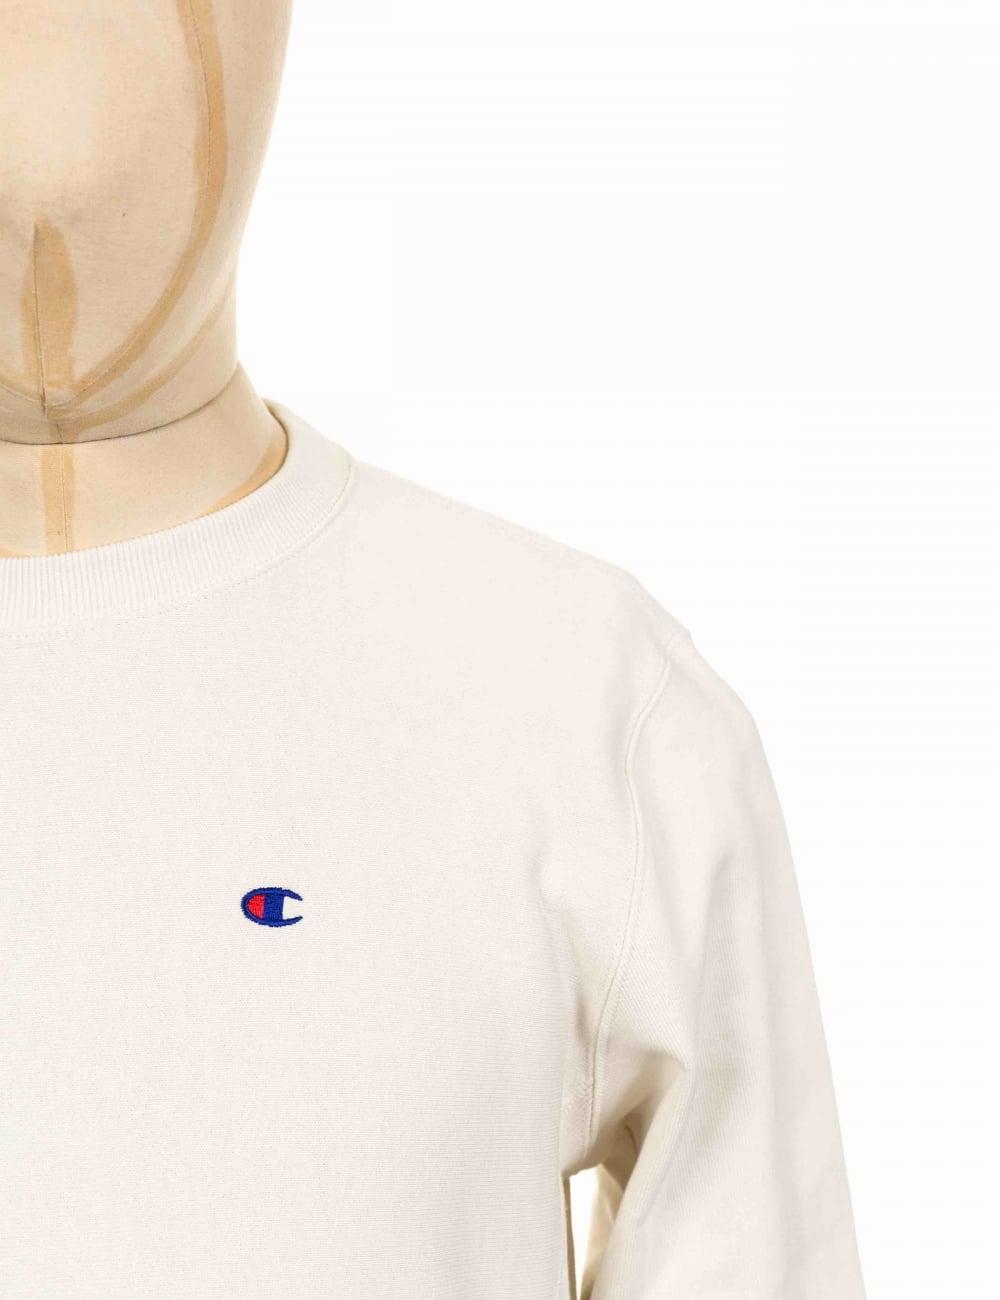 3290beefd Champion Reverse Weave Crewneck Sweatshirt - VAPY White - Clothing ...